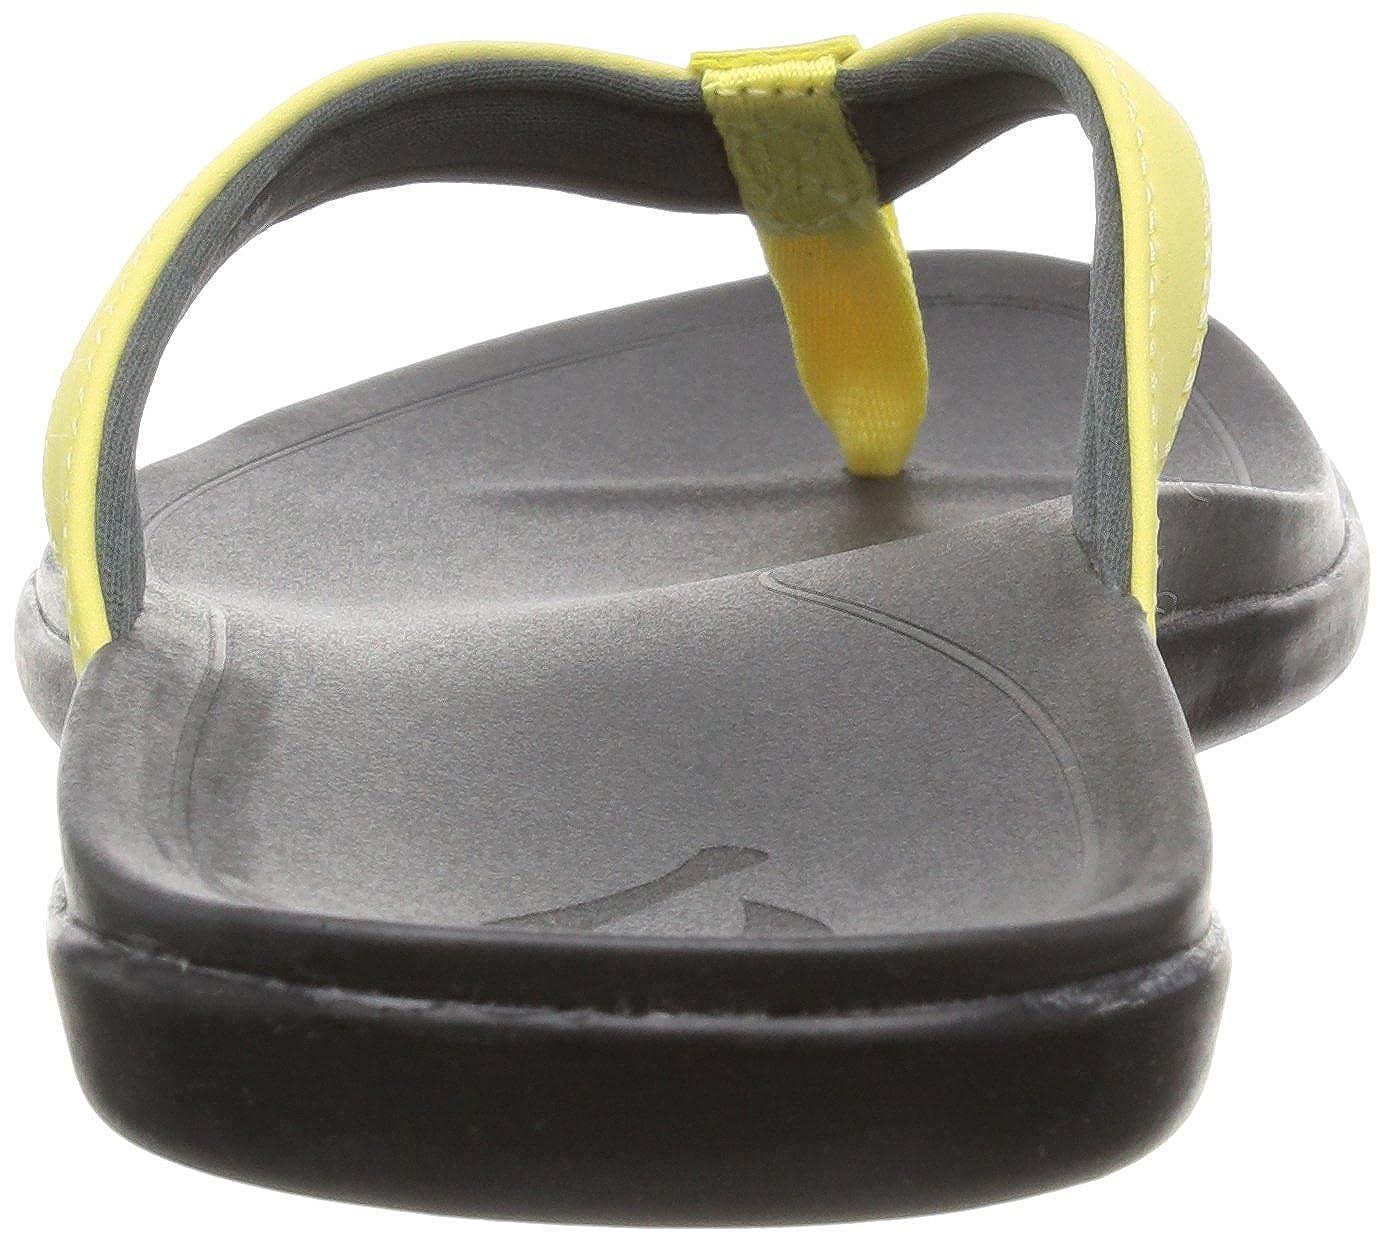 e9d6e75fdb26 Amazon.com  OLUKAI Women s Ho Opio Sandal  Shoes